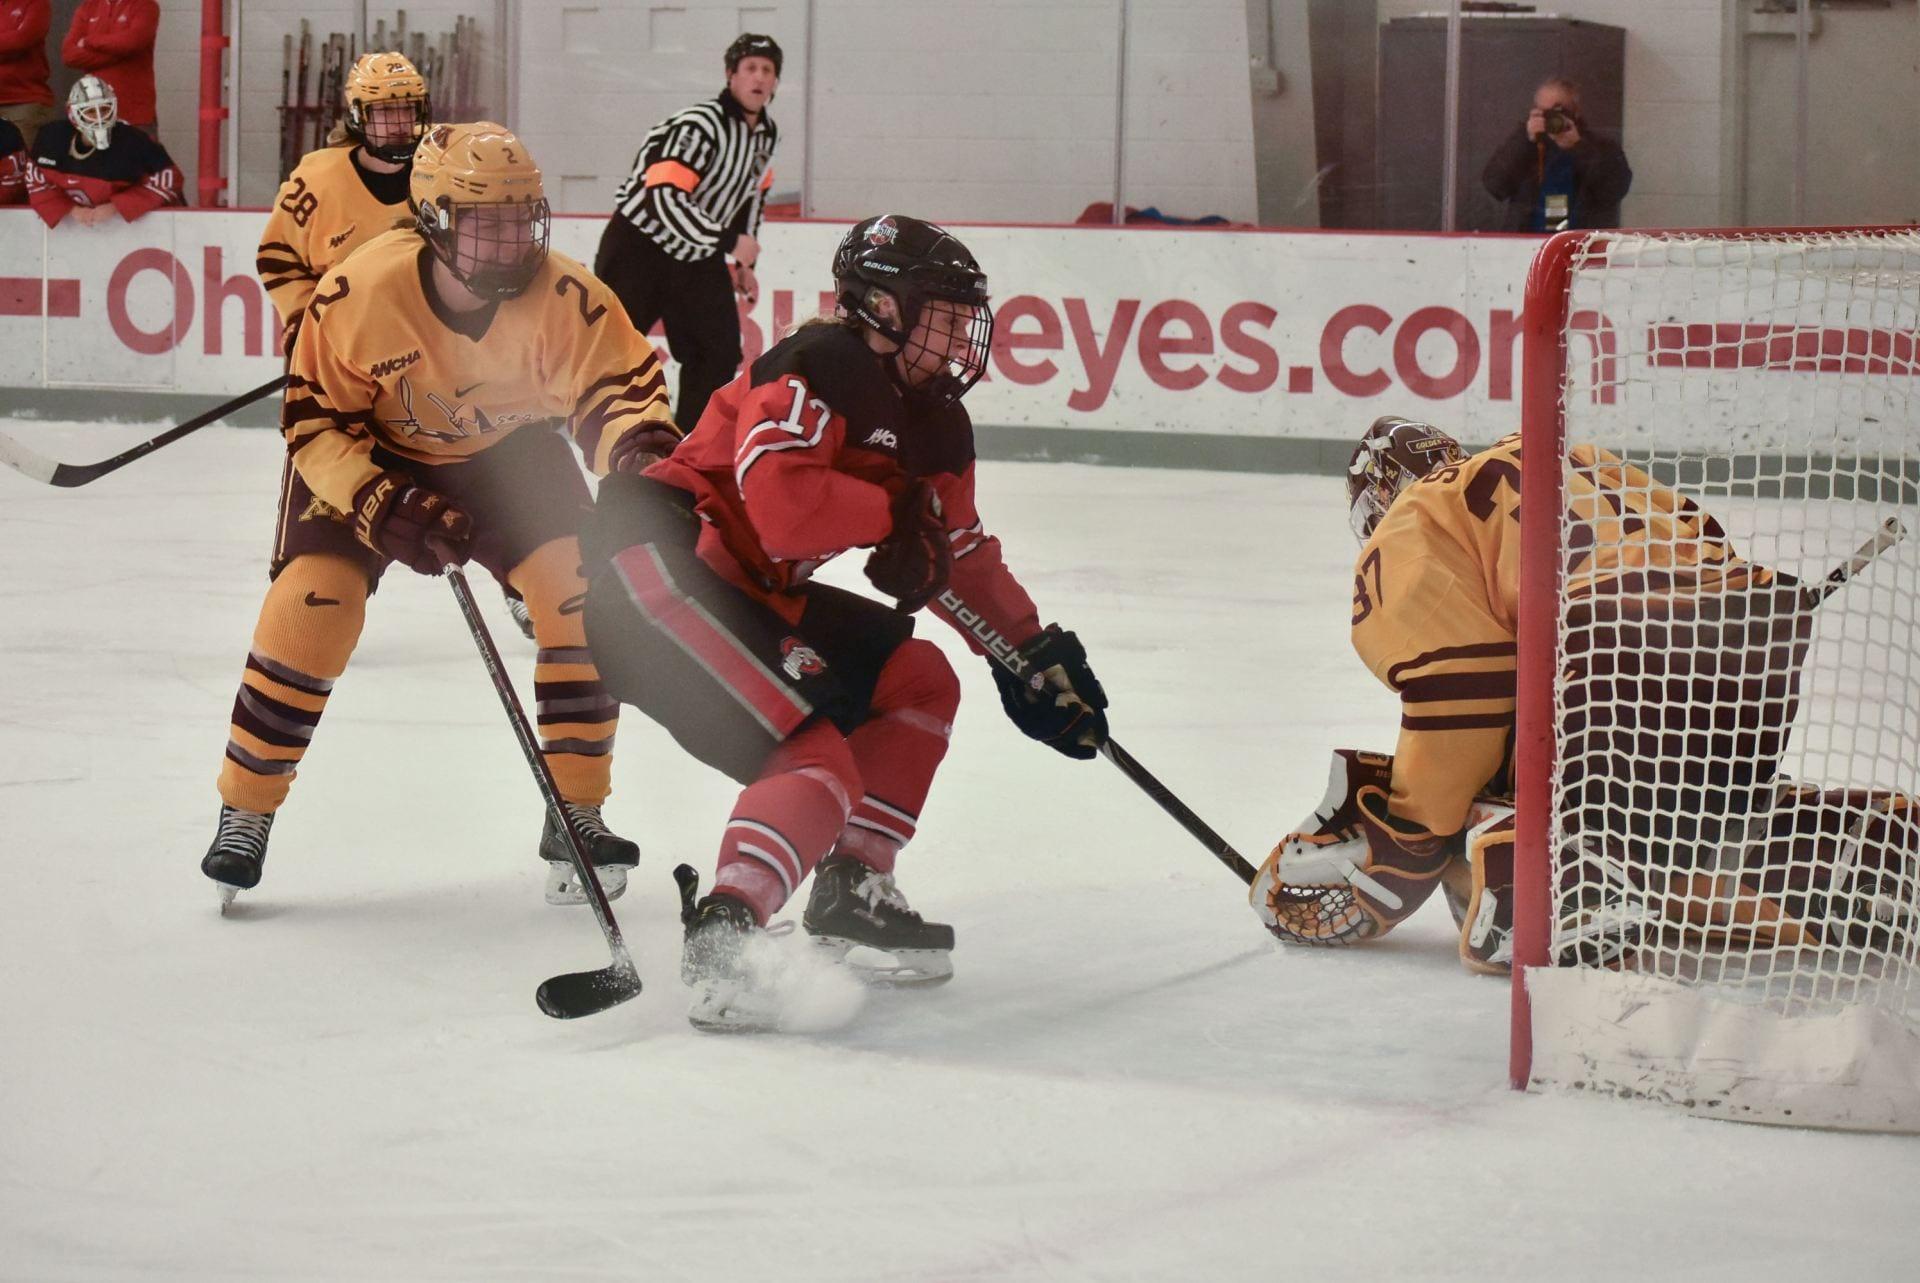 Women's Hockey: No. 7 Ohio State defeats No. 9 Minnesota Duluth 3-1